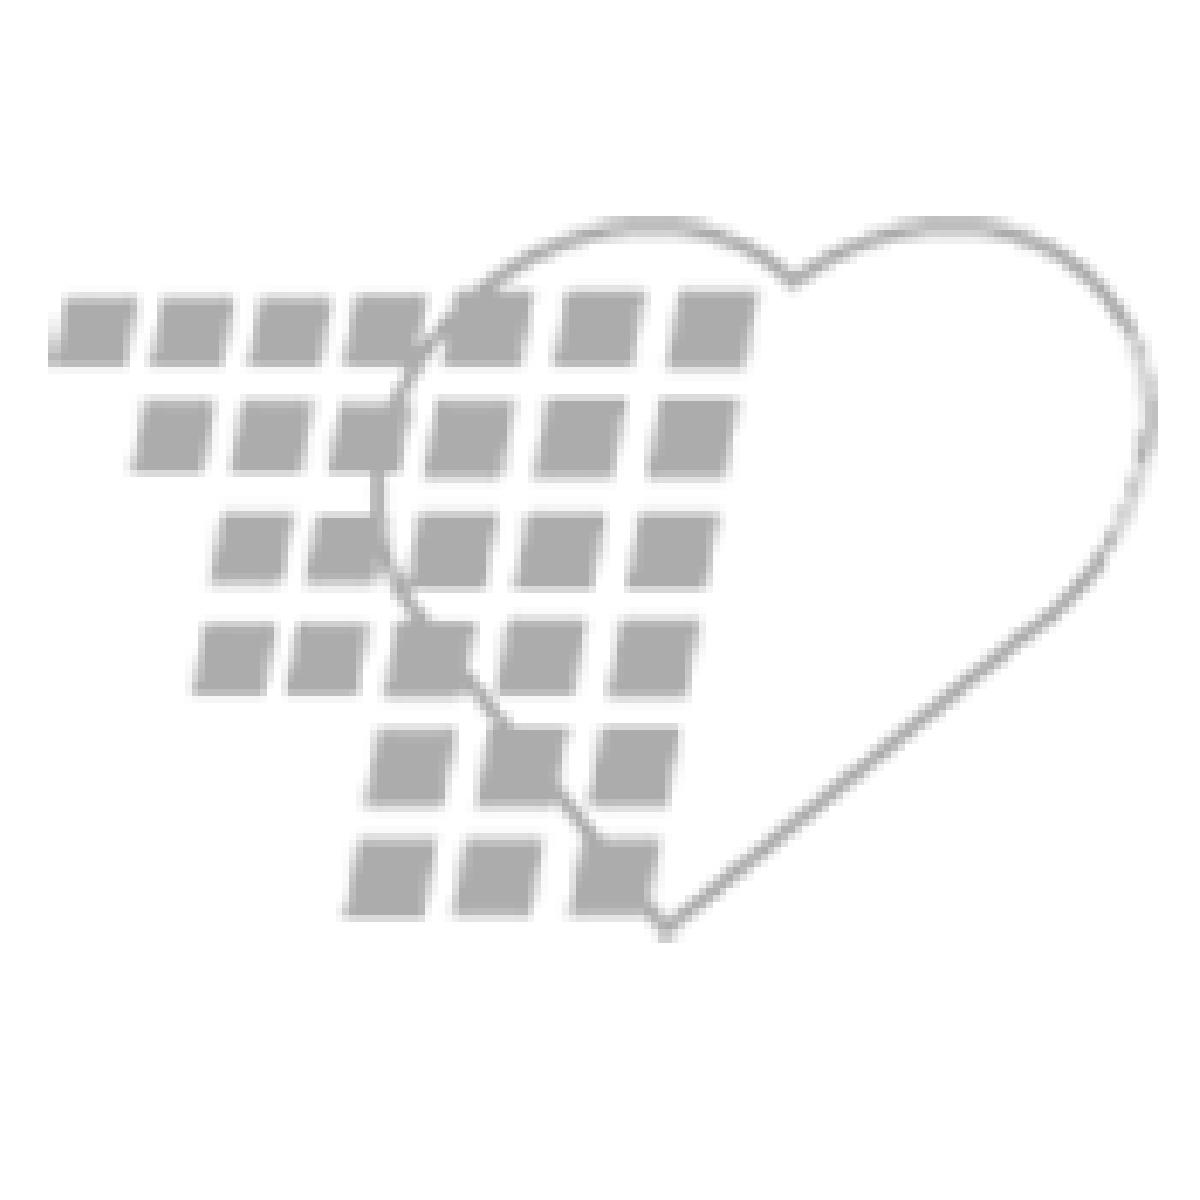 04-71-1008 Amico Teaching Mobile Vertical Headwall - Semi Private